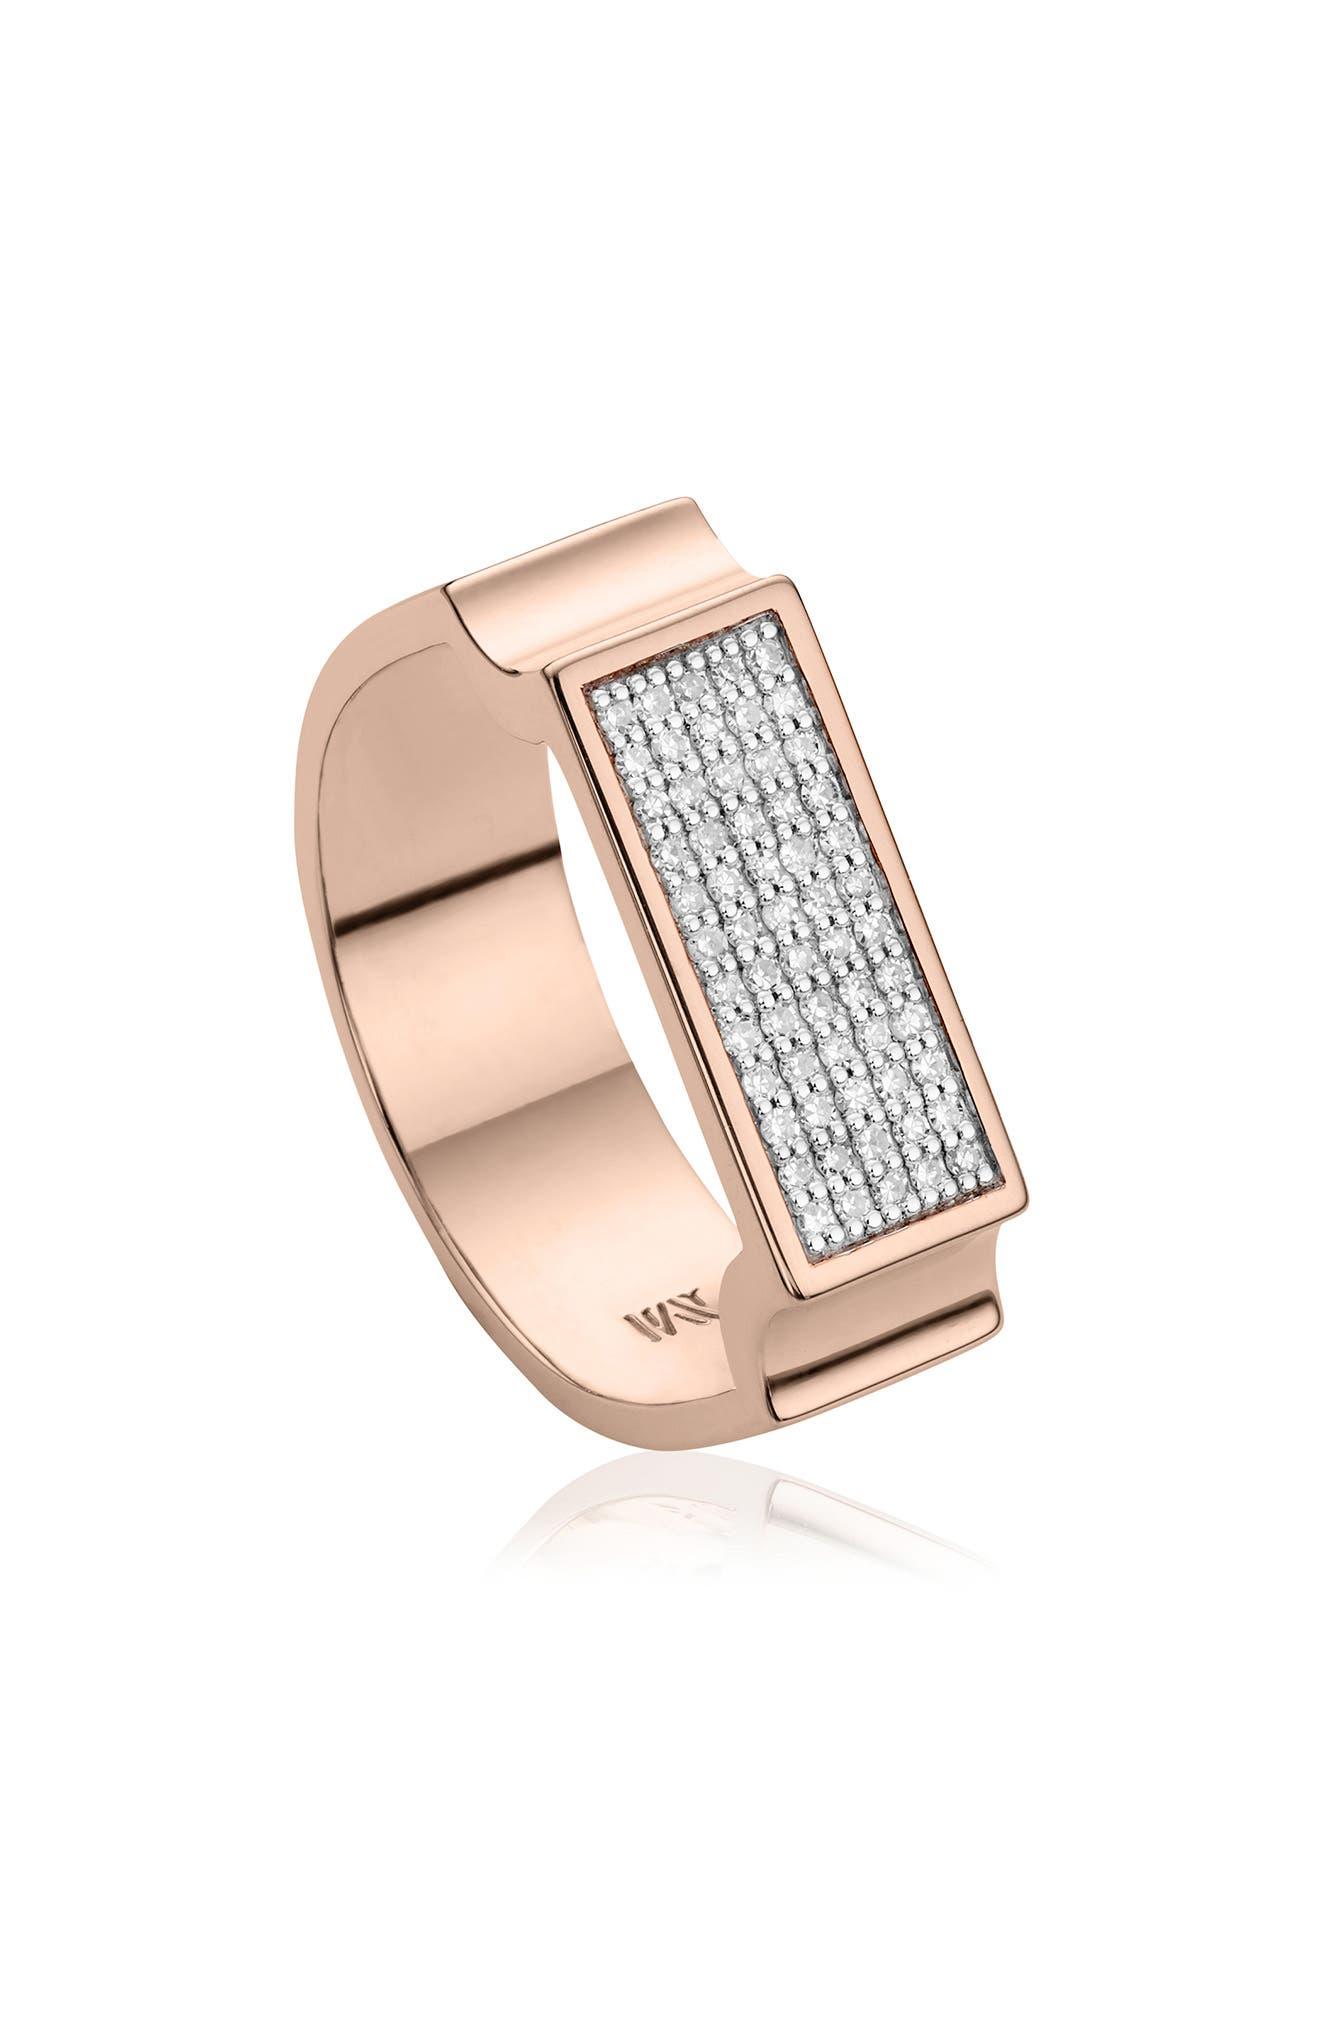 Diamond Signature Wide Ring,                         Main,                         color, ROSE GOLD/ DIAMOND